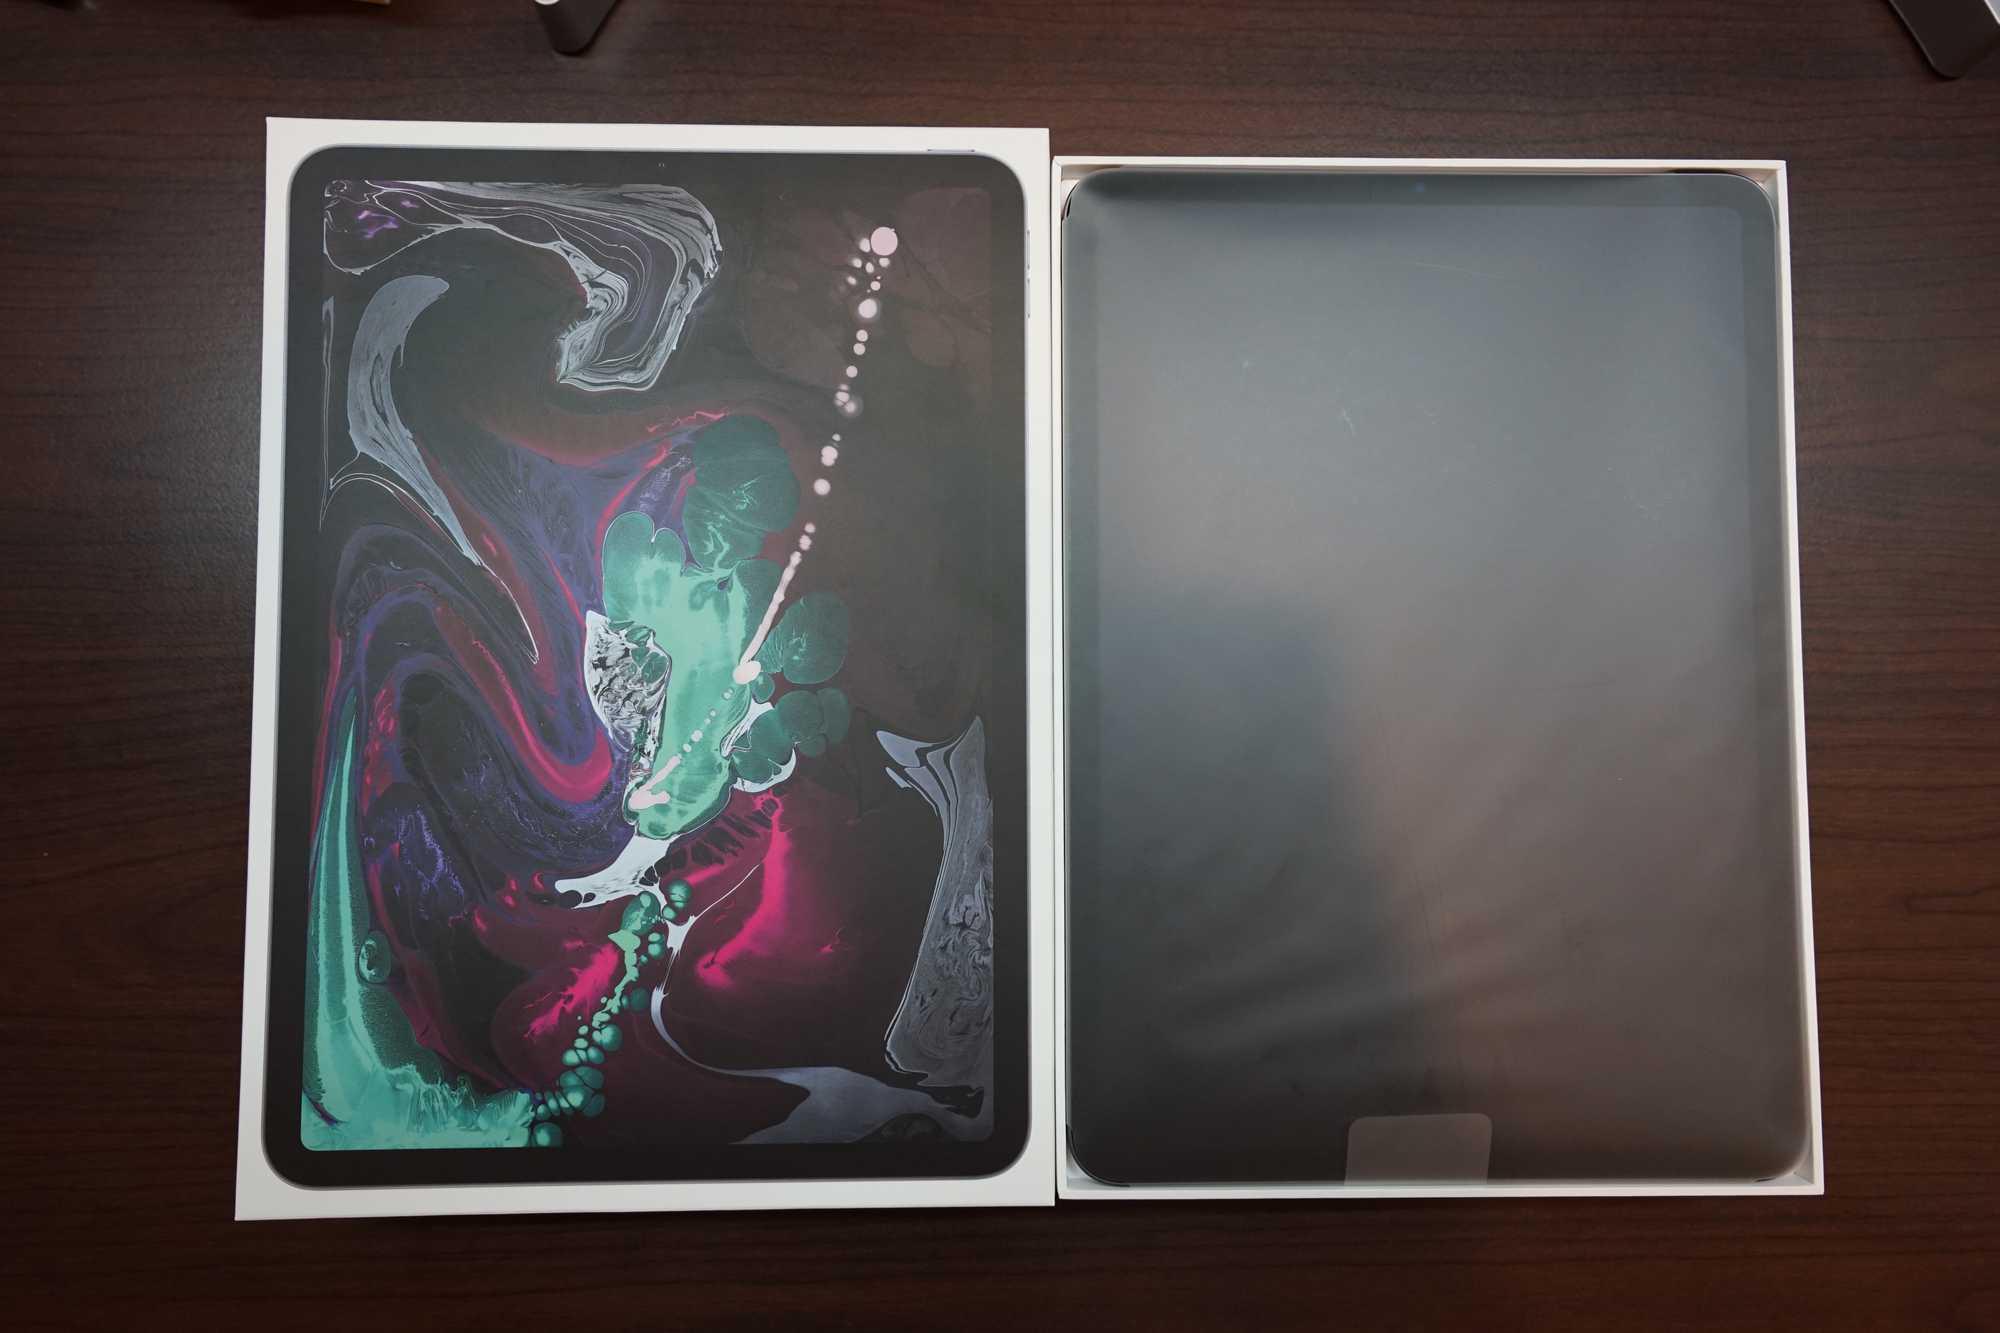 iPad Pro 11-inch Inside the box